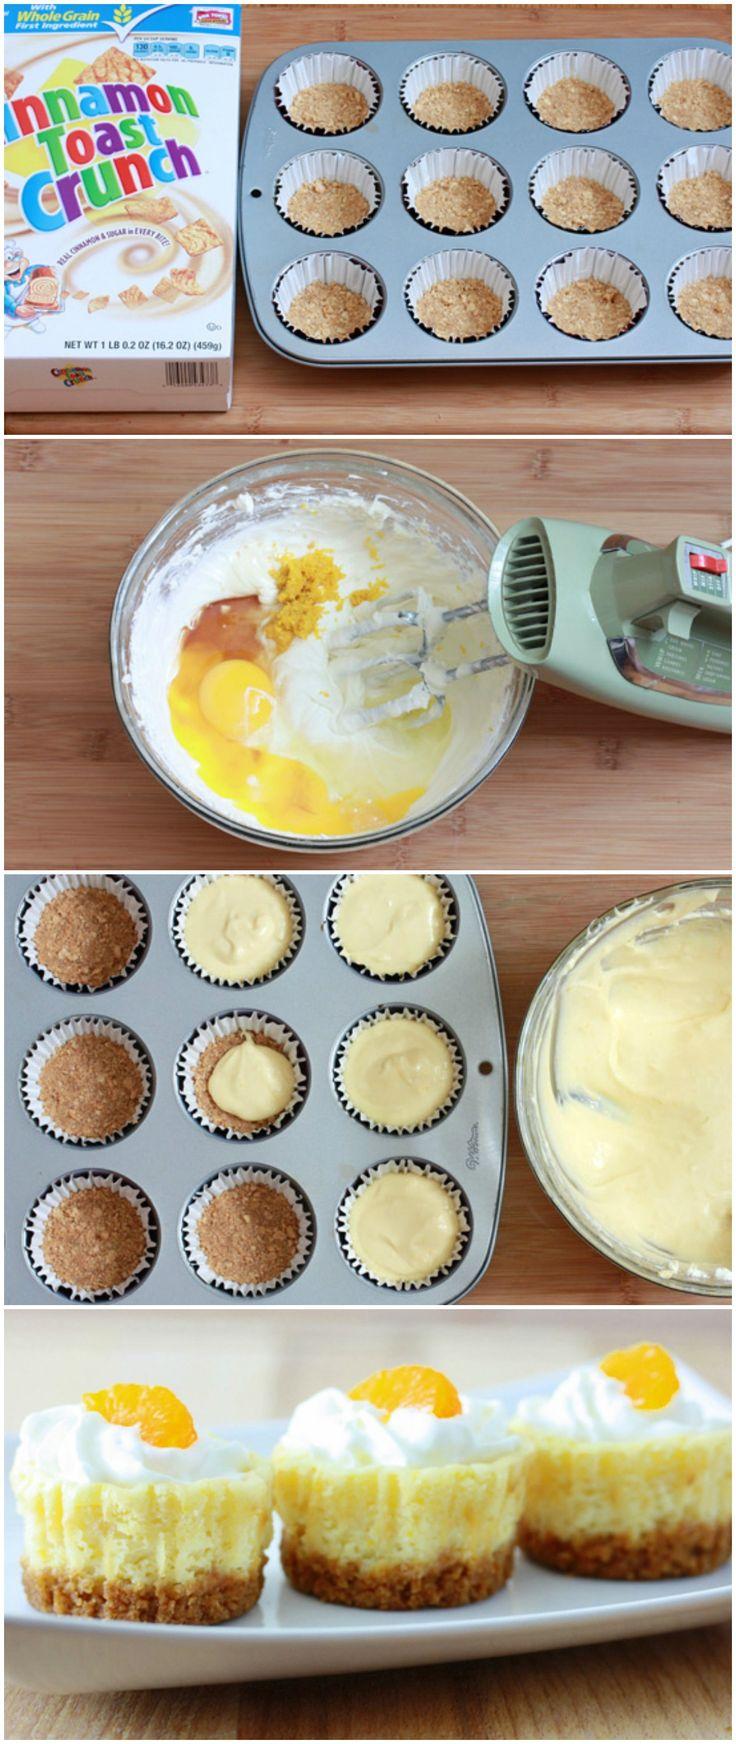 Mini Mandarin Orange Cheesecakes